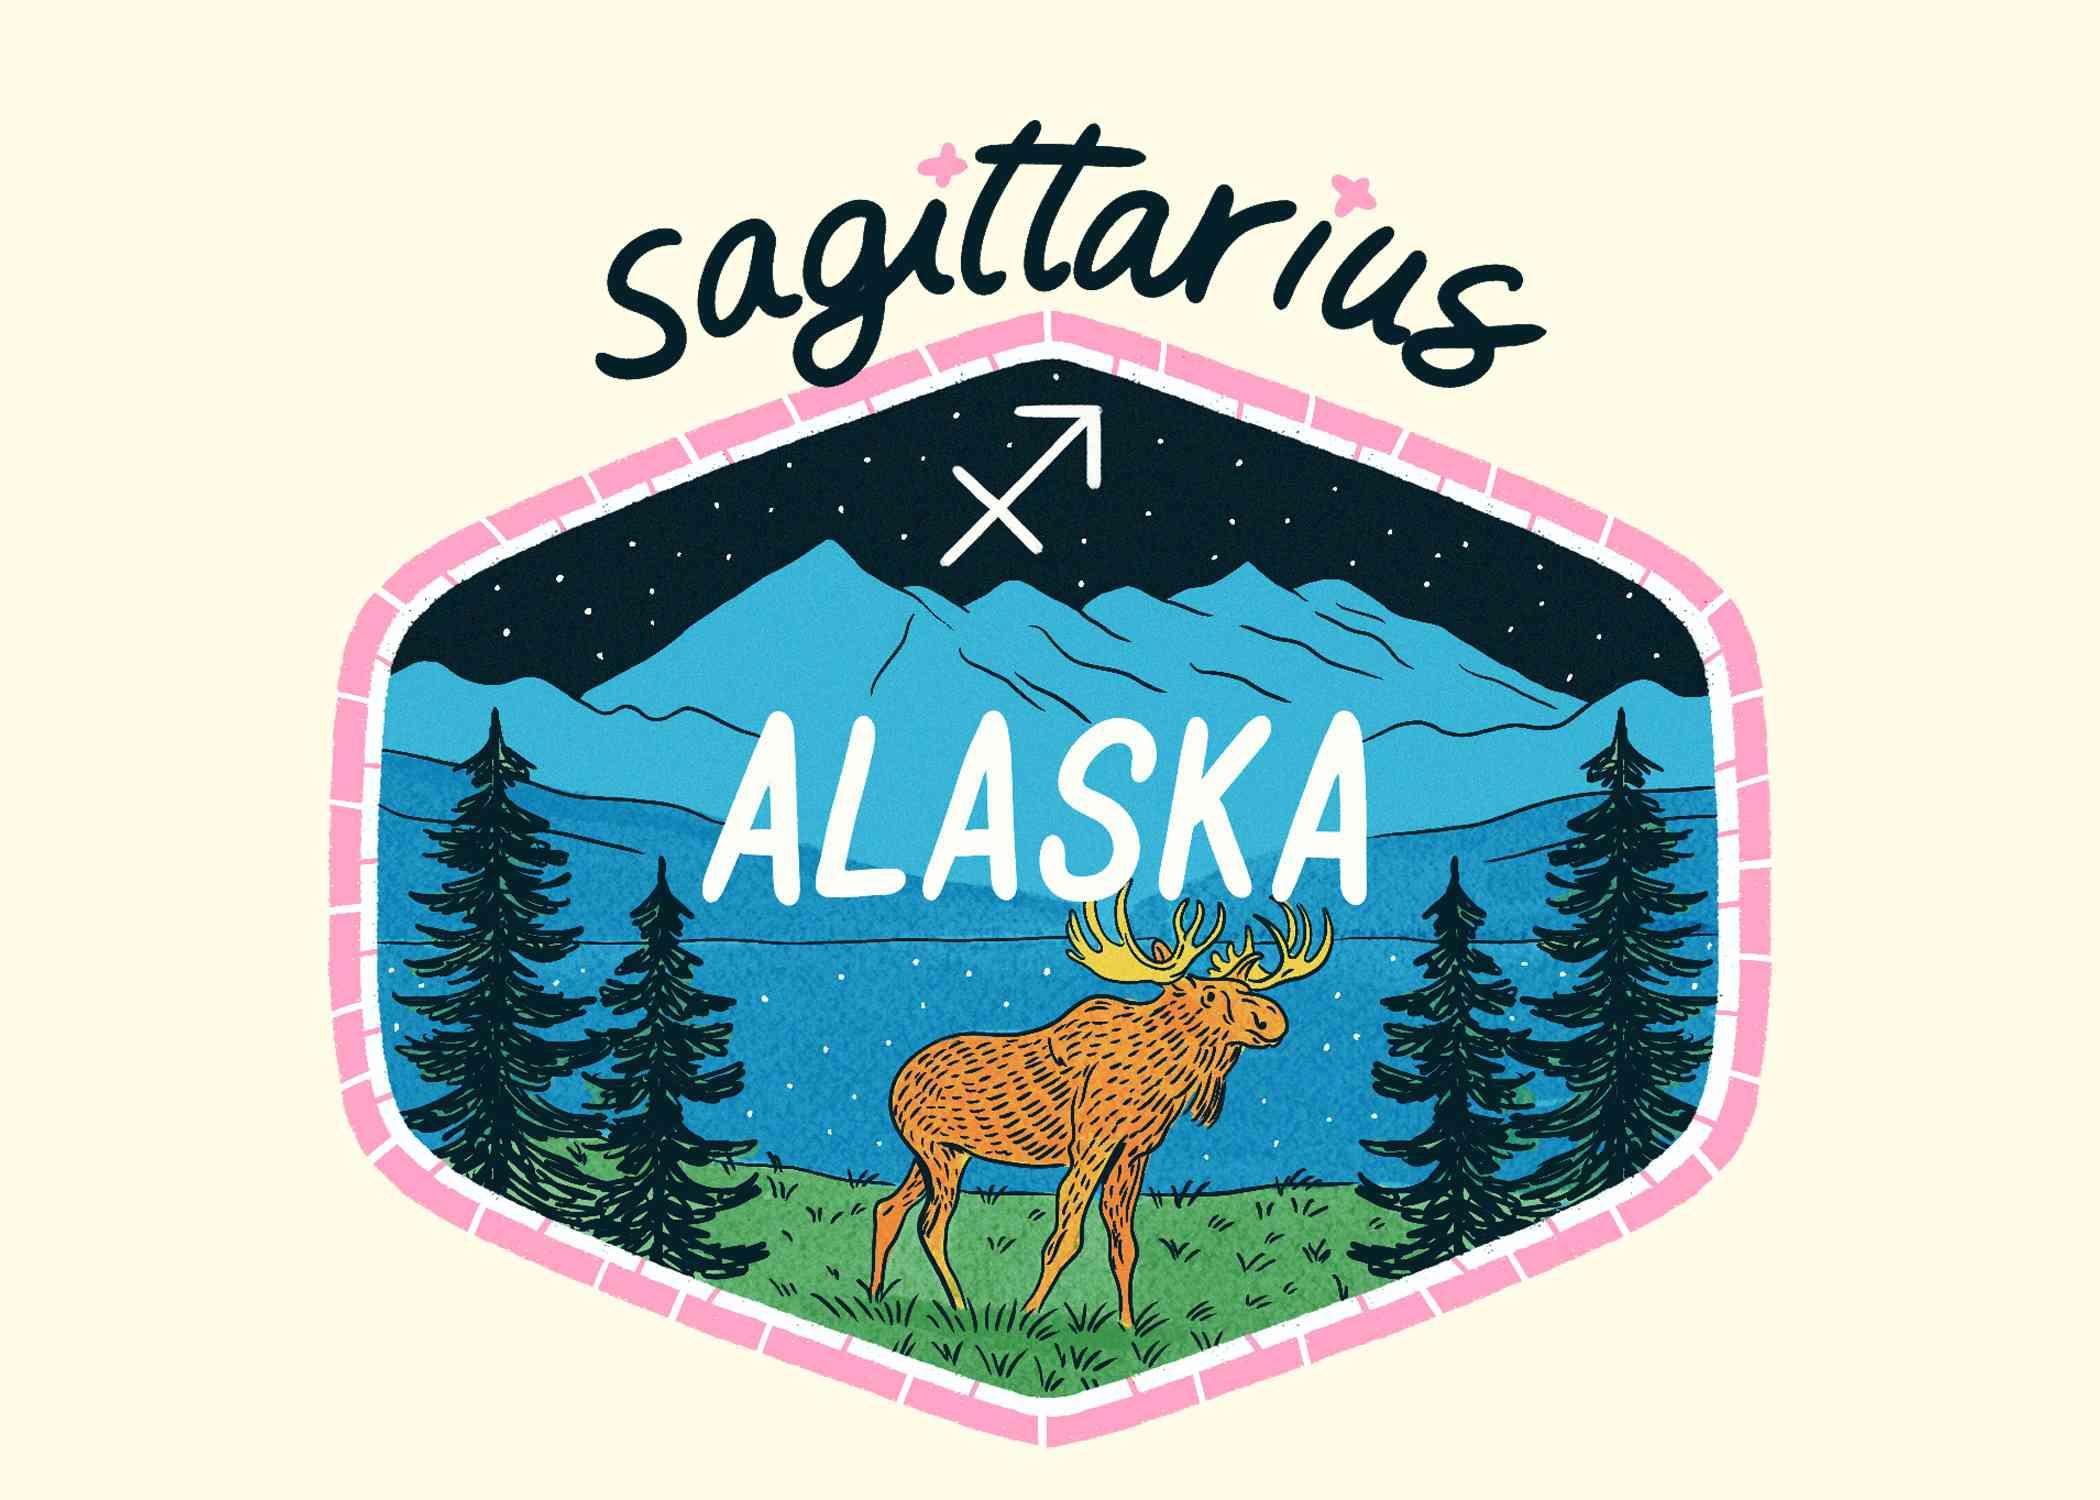 An illustration of Alaska for Sagittarius